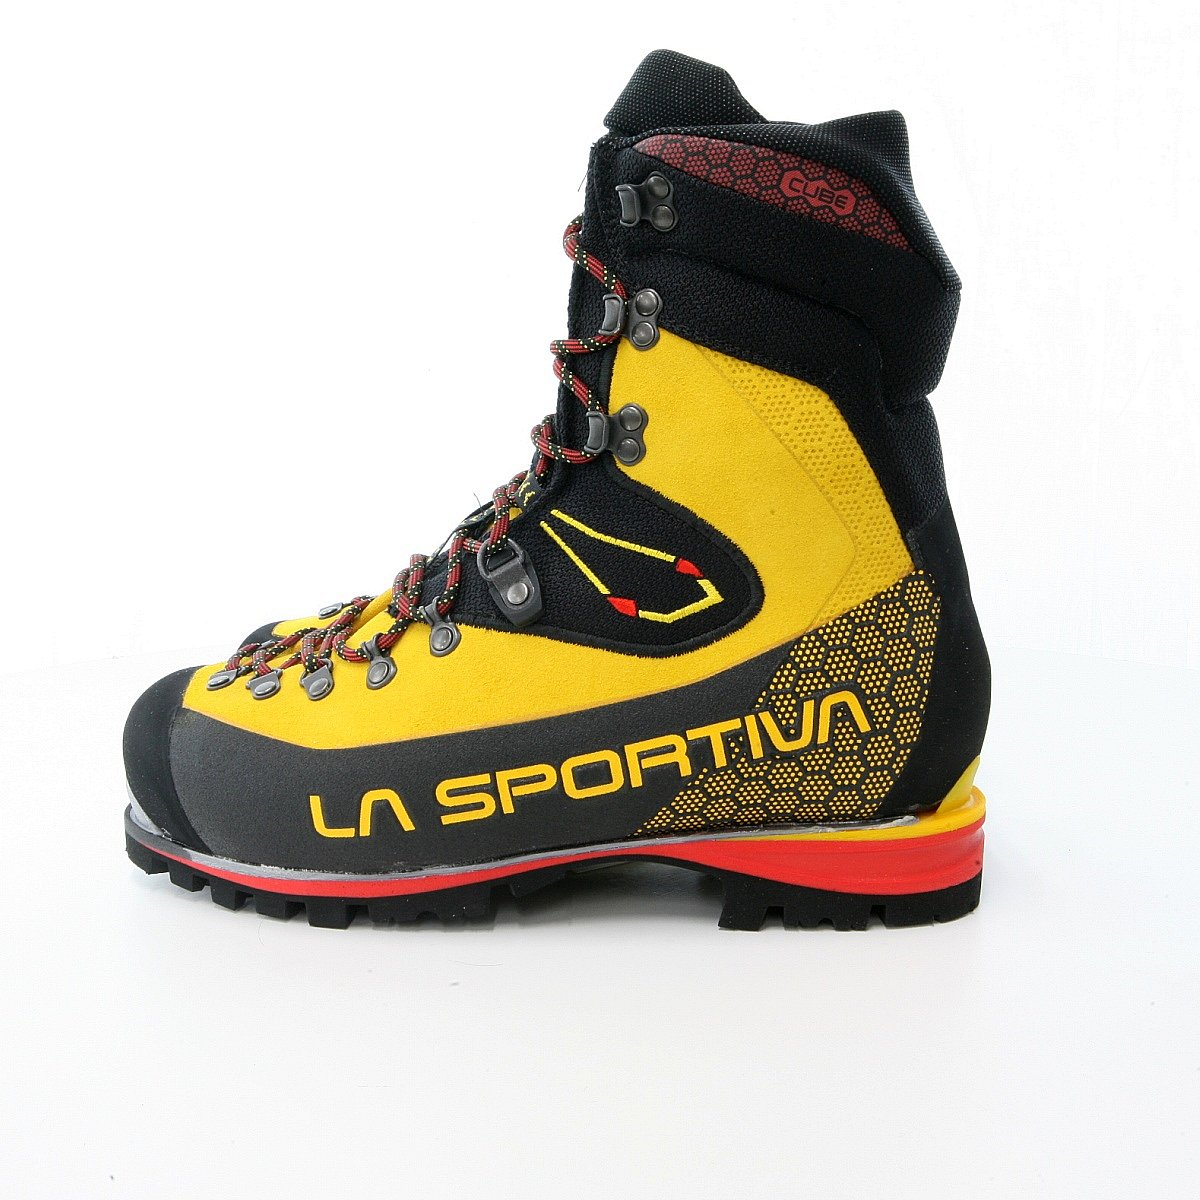 LaSportiva(スポルティバ)『ネパールキューブGTX』